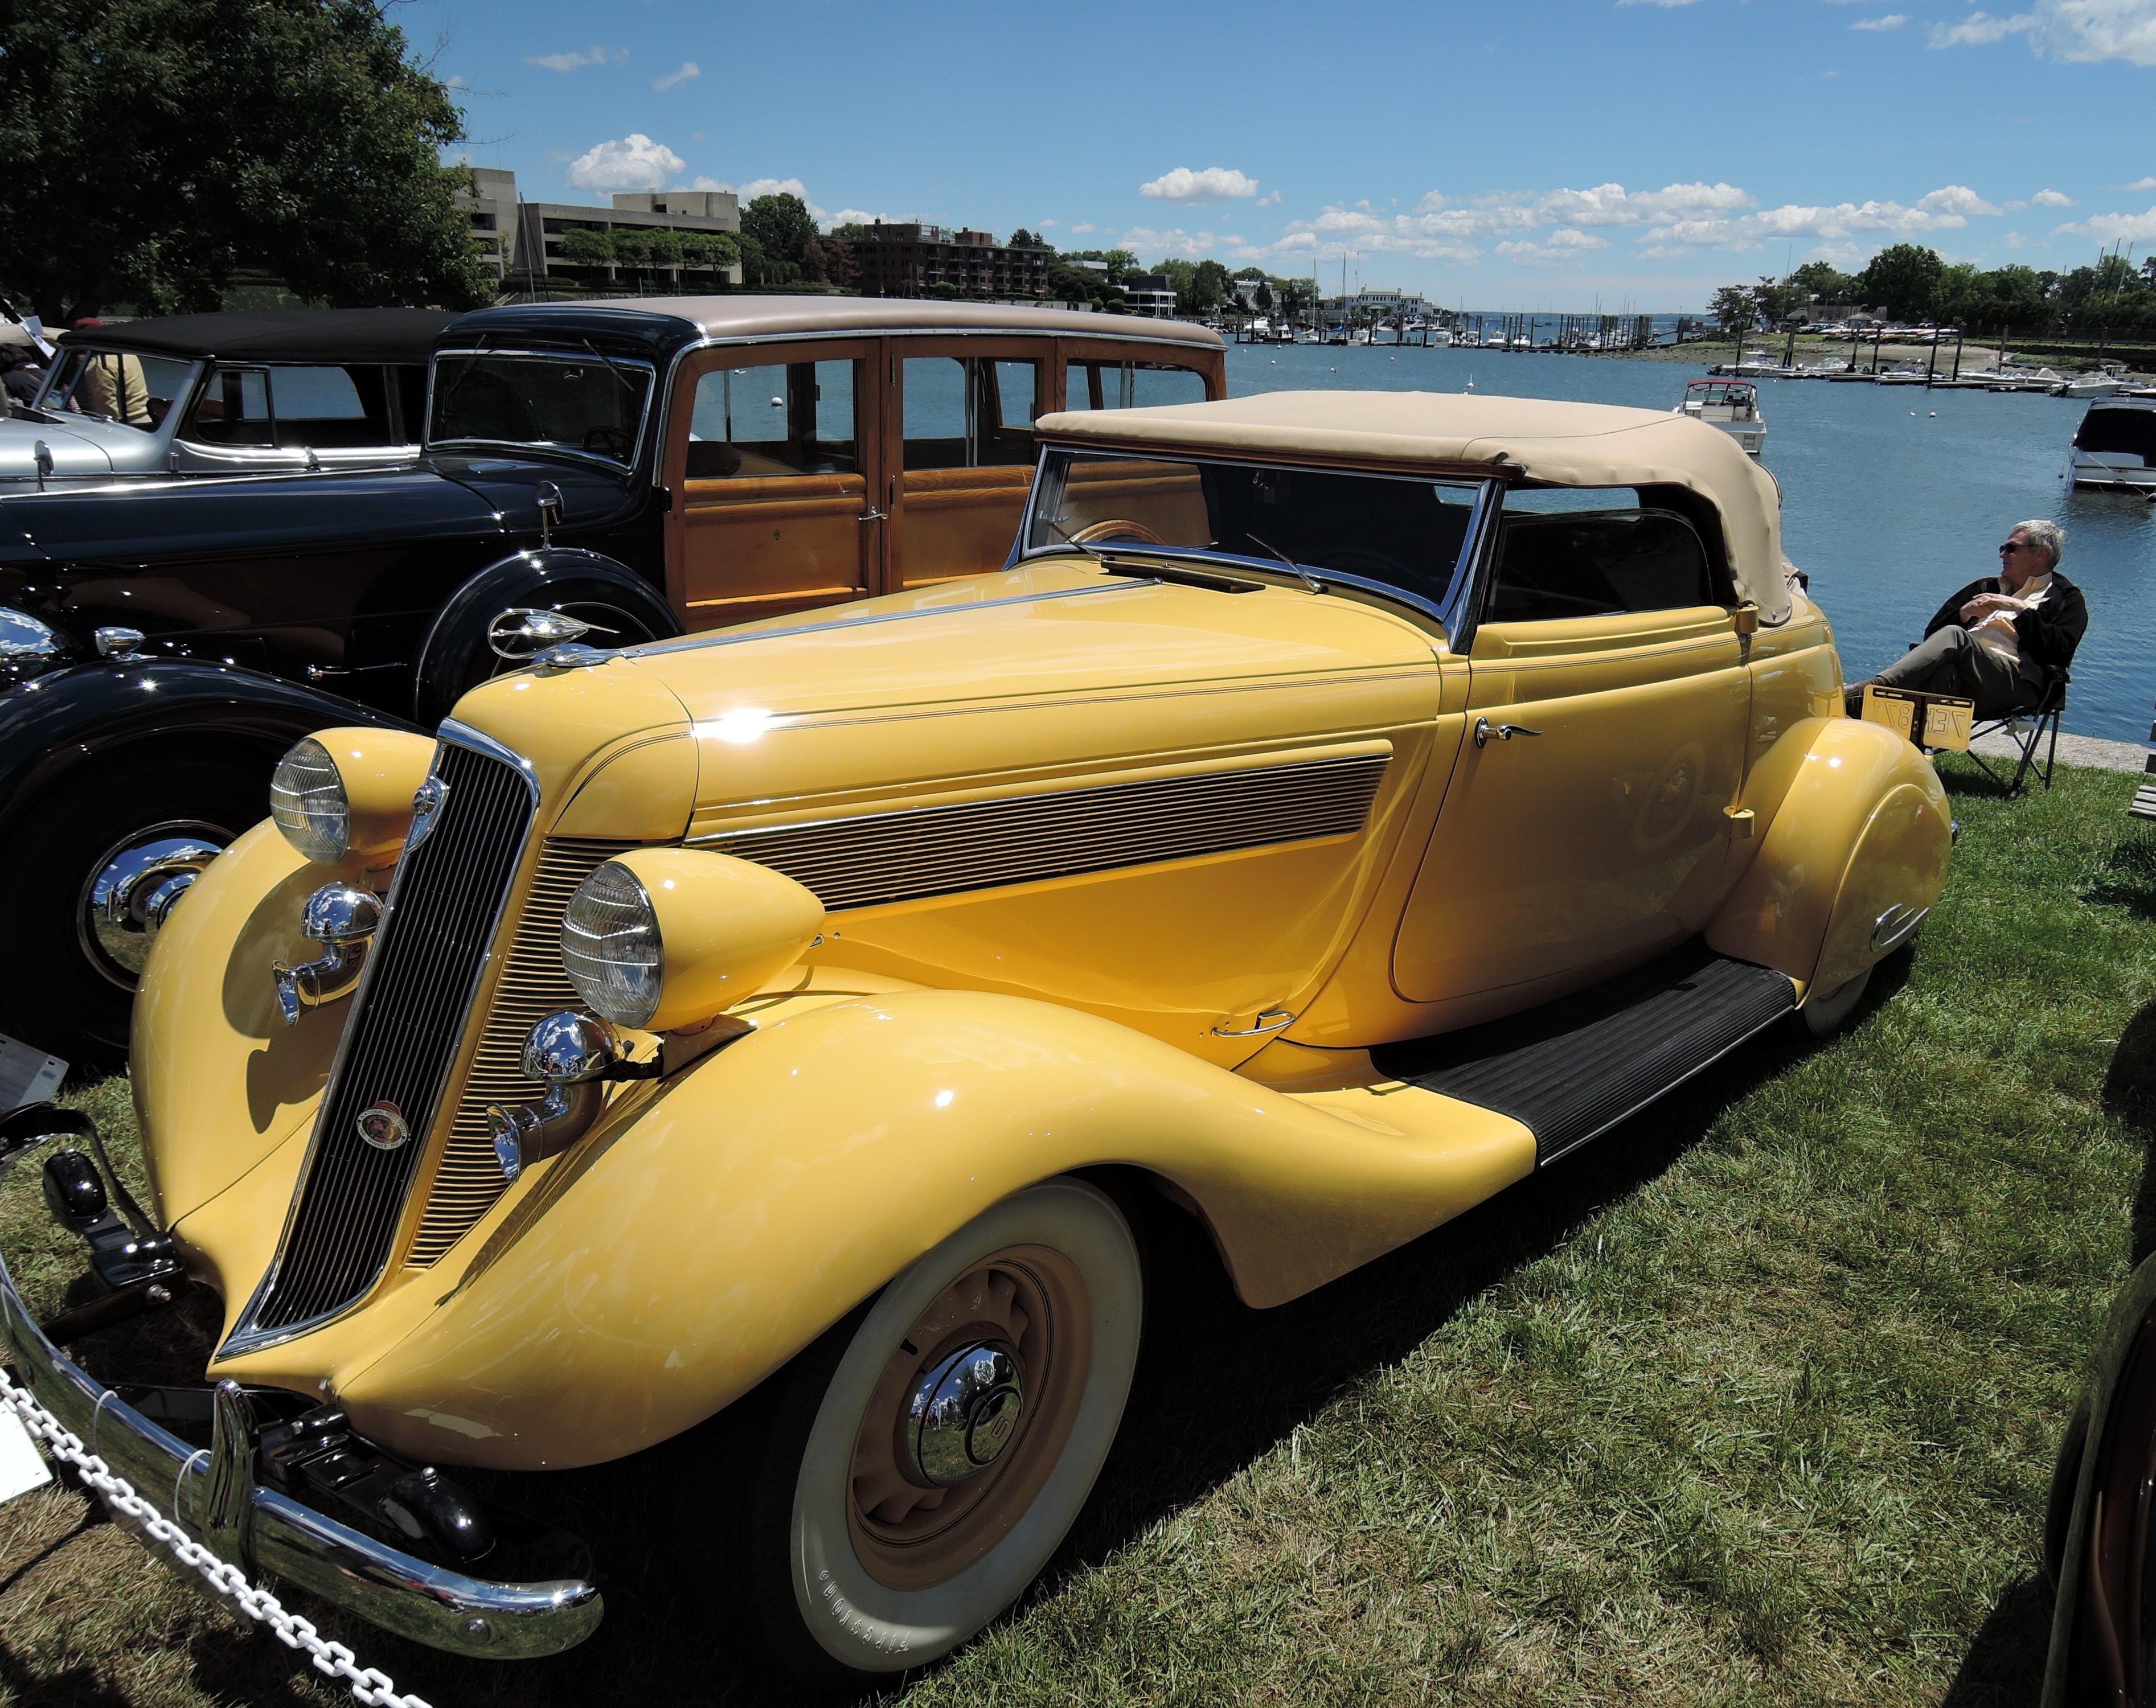 yellow 1935 Studebaker Commander Roadster - Greenwich Concours d'Elegance 2017